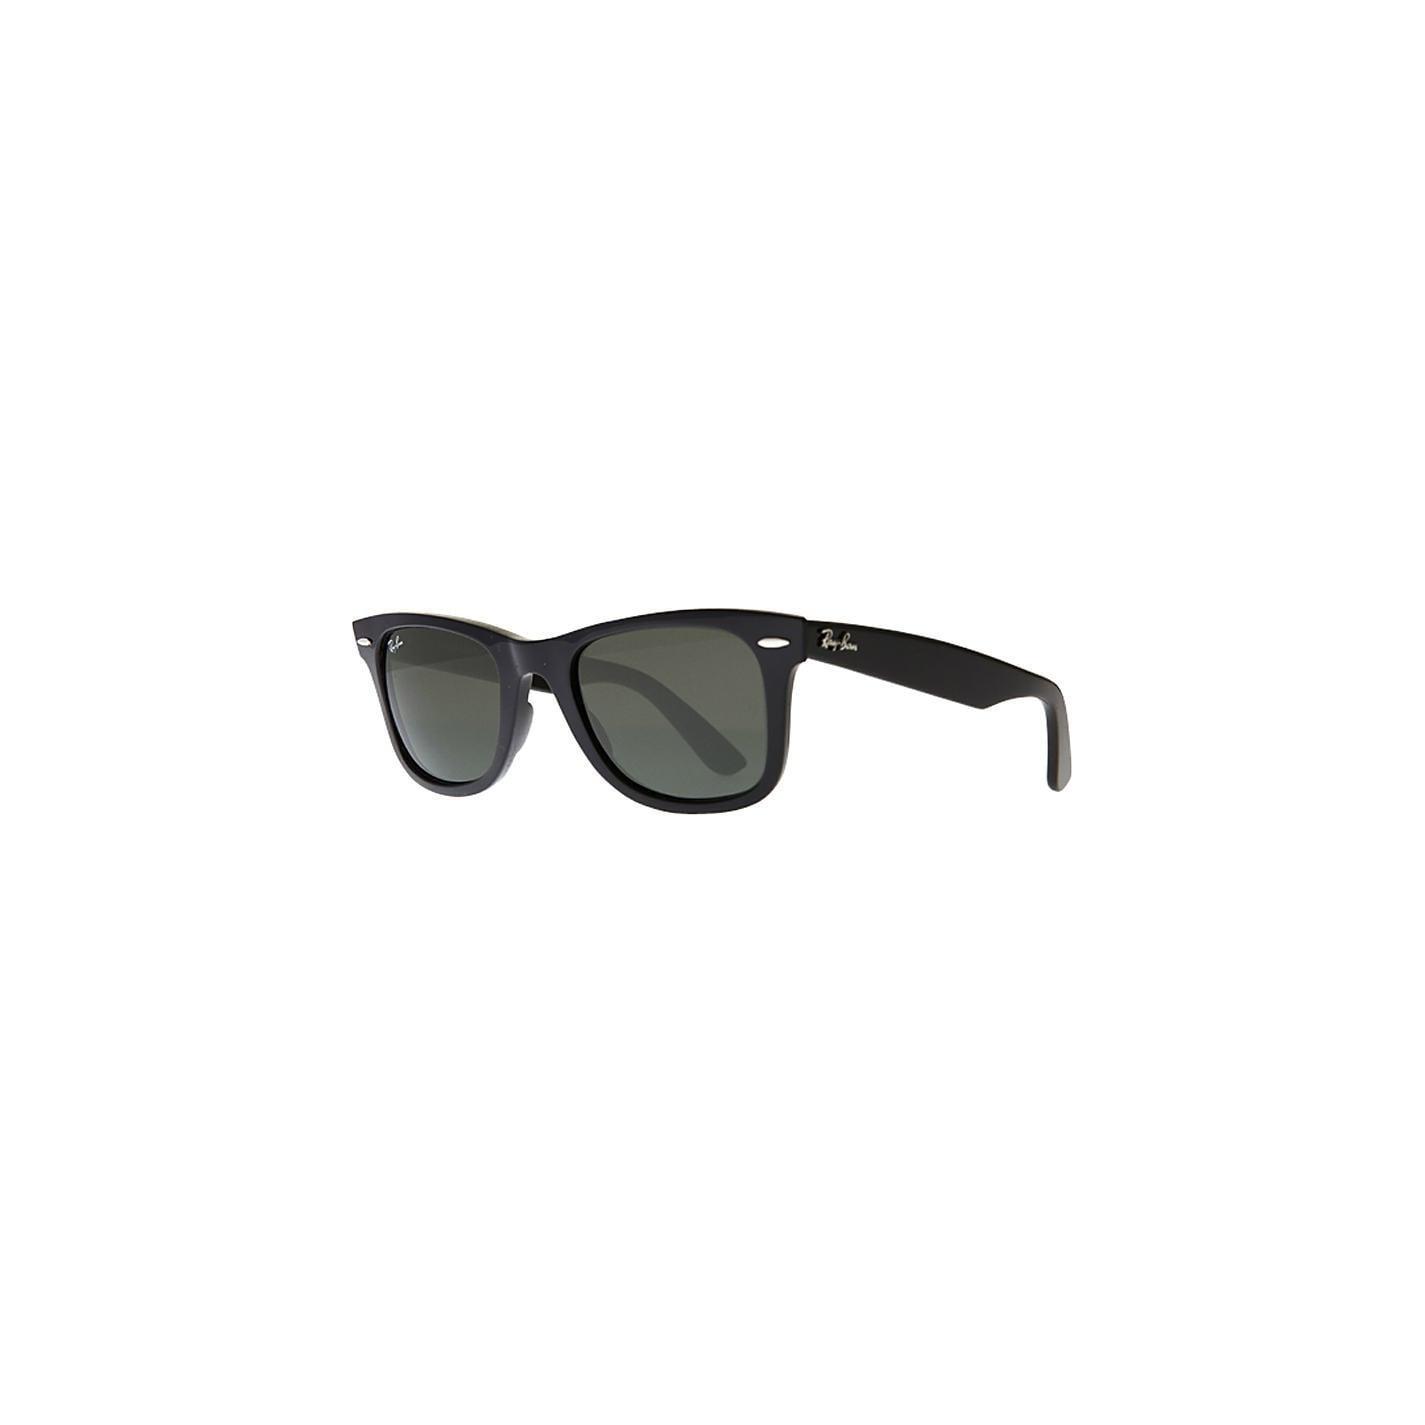 8911ab5f4b1 Ray-Ban RB2140 901 58 Original Wayfarer Classic Unisex Black Frame Polarized  Green 54mm Lens Sunglasses